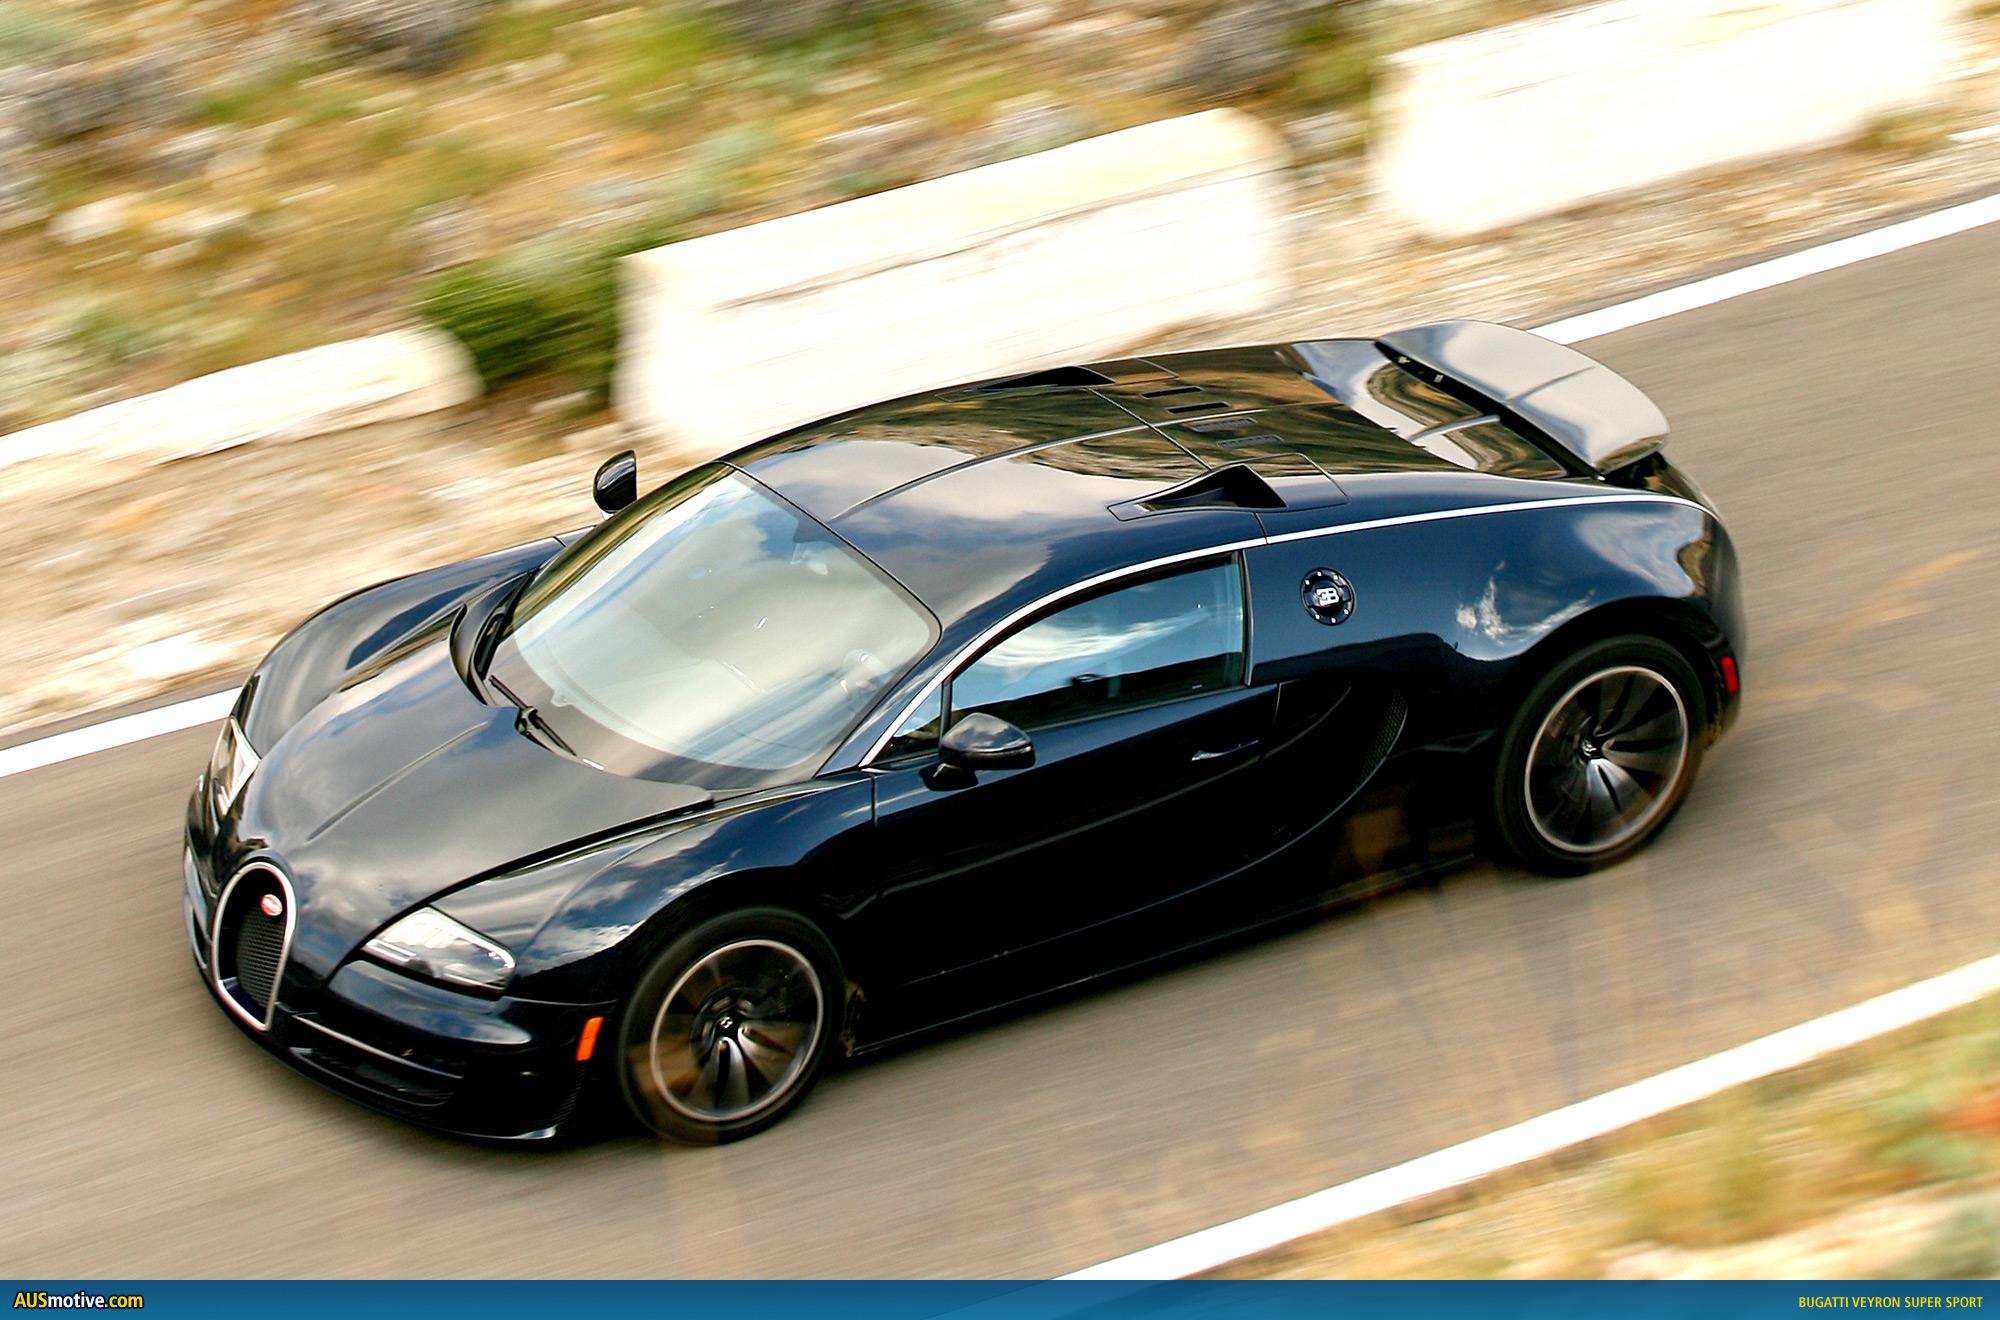 bugatti veyron super sport - Bugatti Veyron Super Sport Top Gear Wallpaper